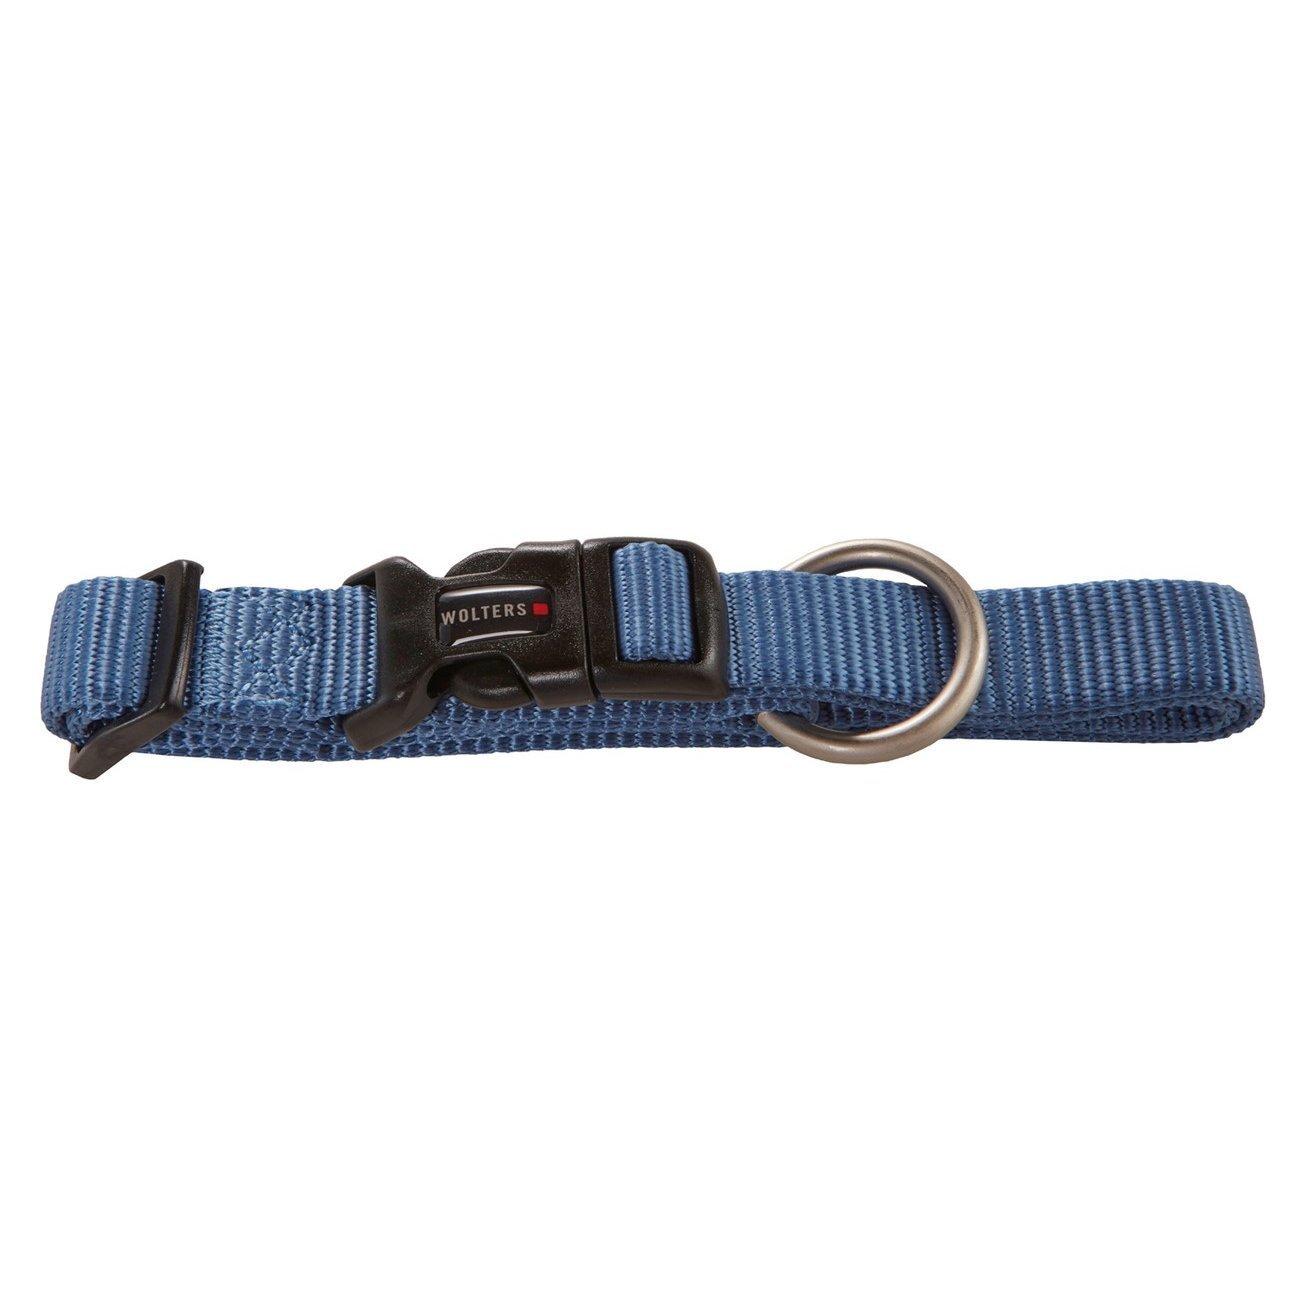 Wolters Halsband Extra Breit Professional Nylon, Bild 8